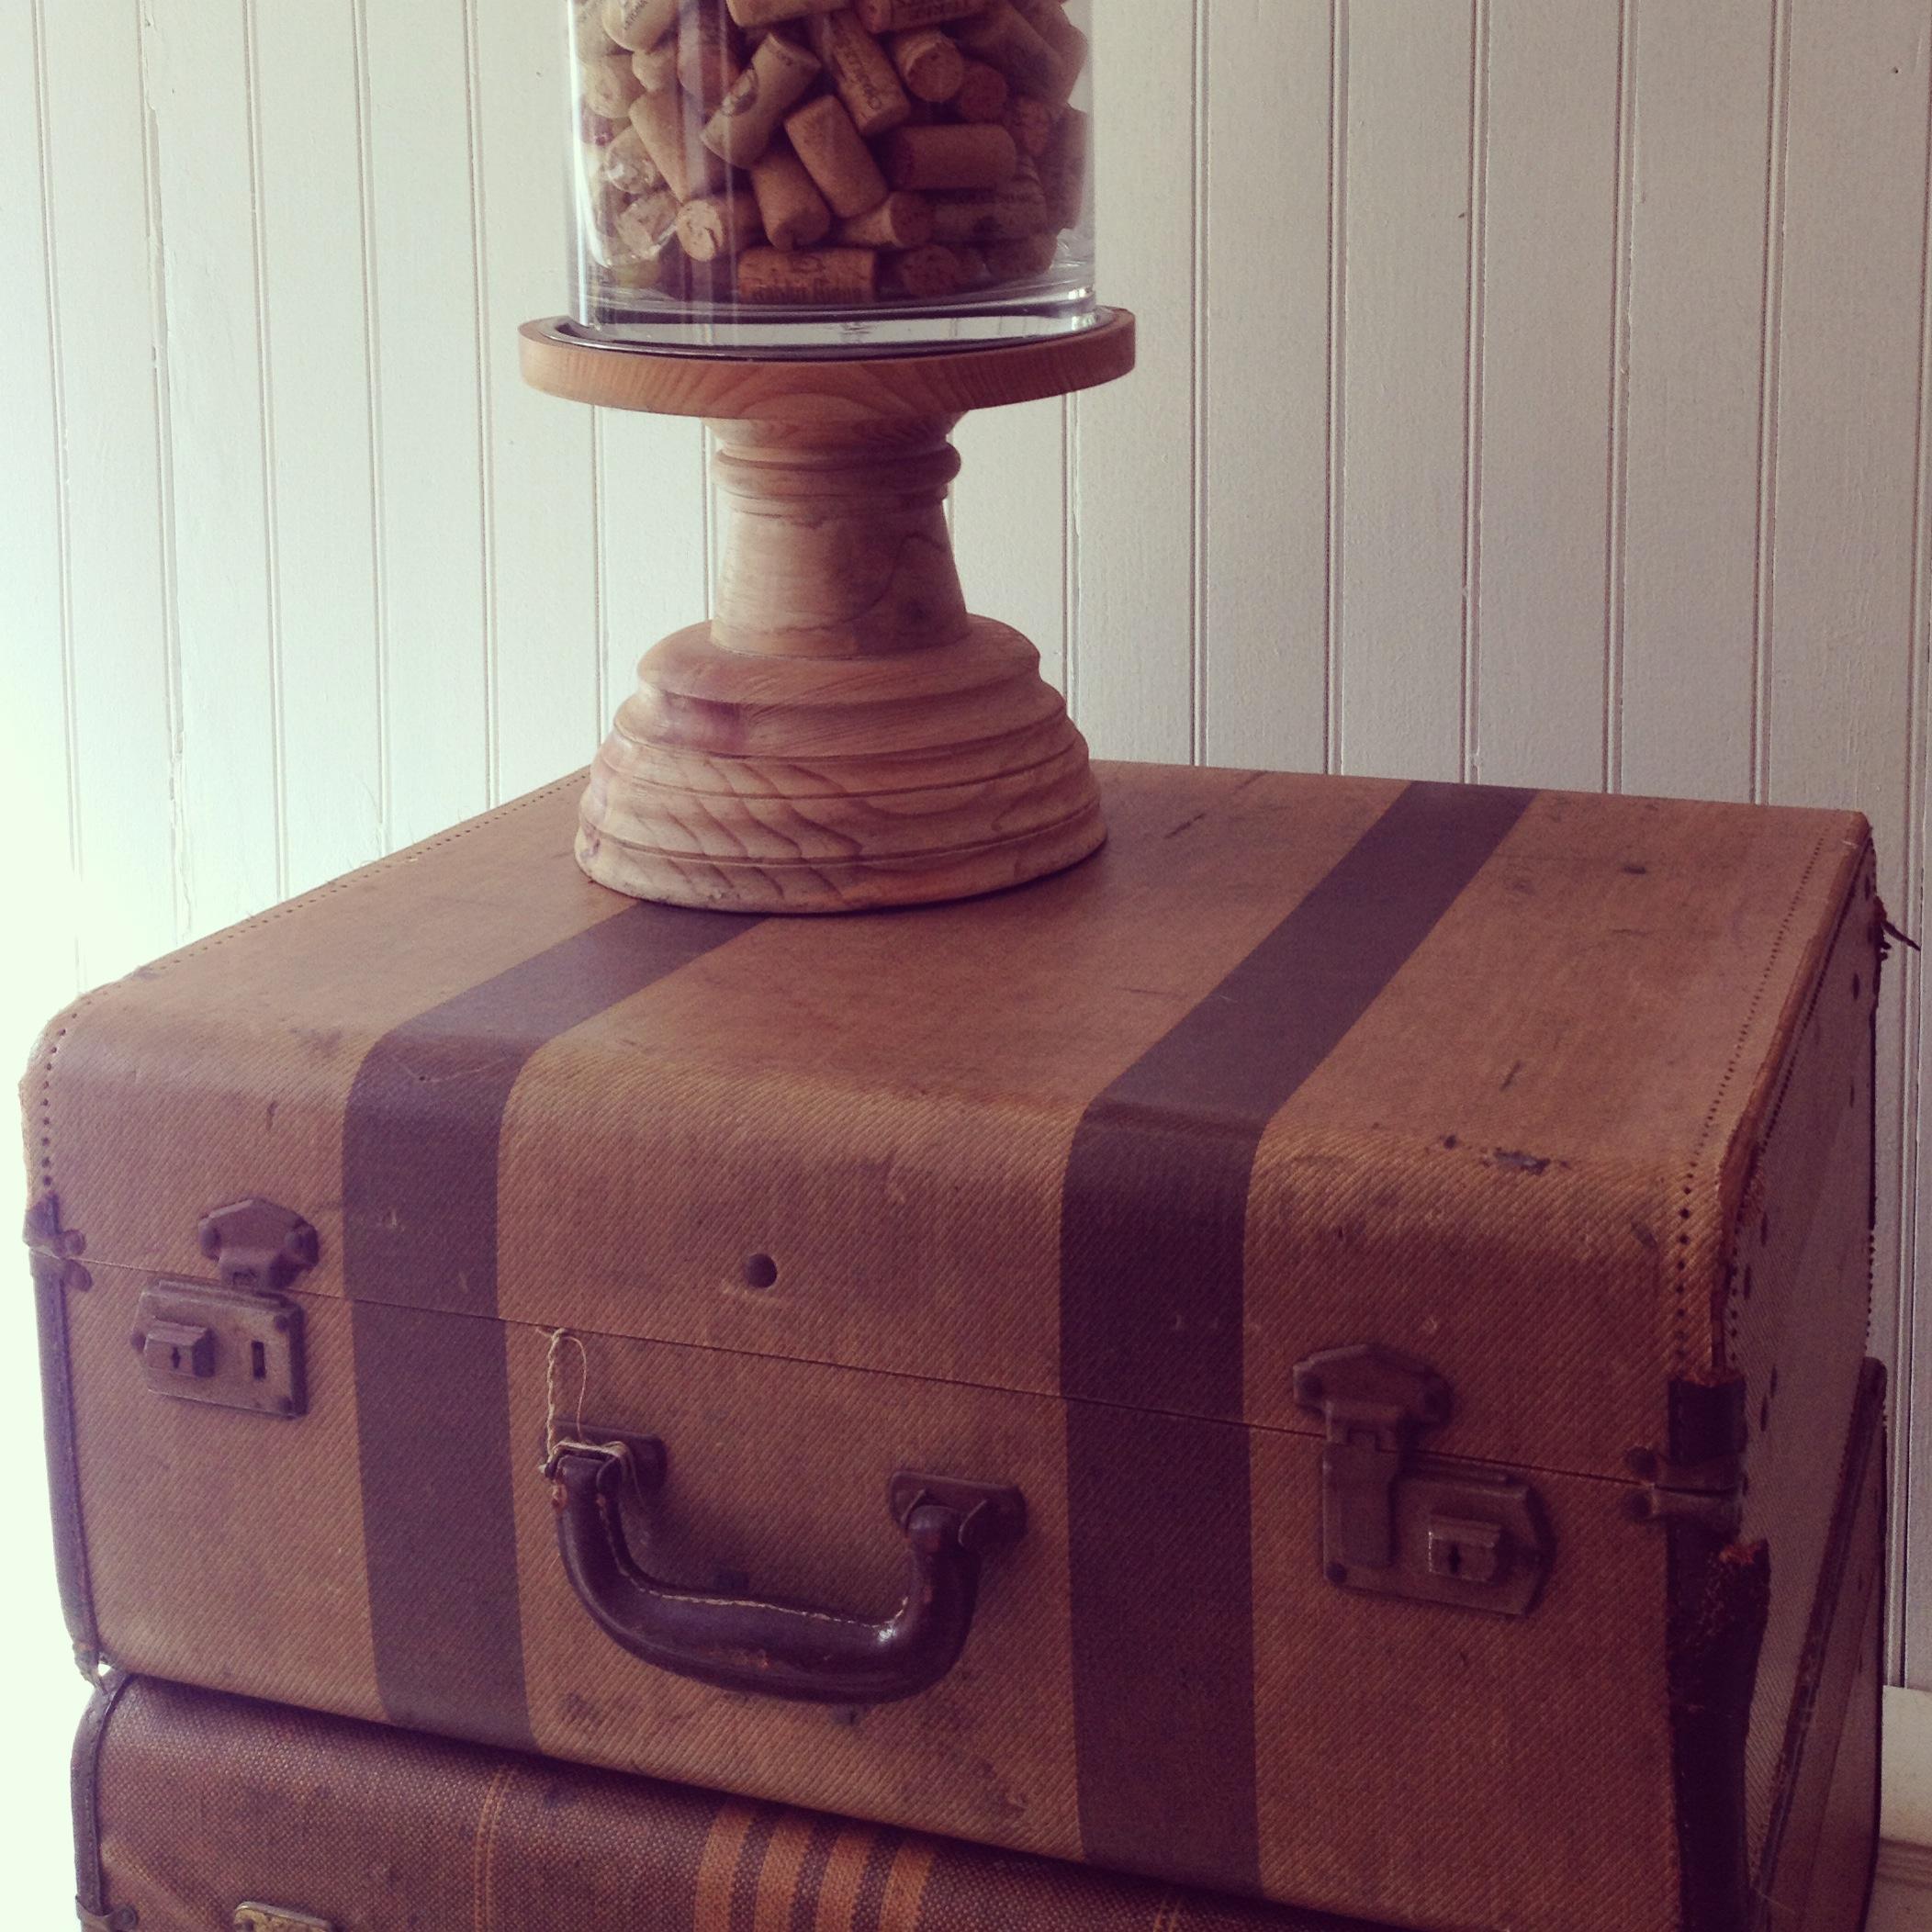 {Carola Tan Suitcase}